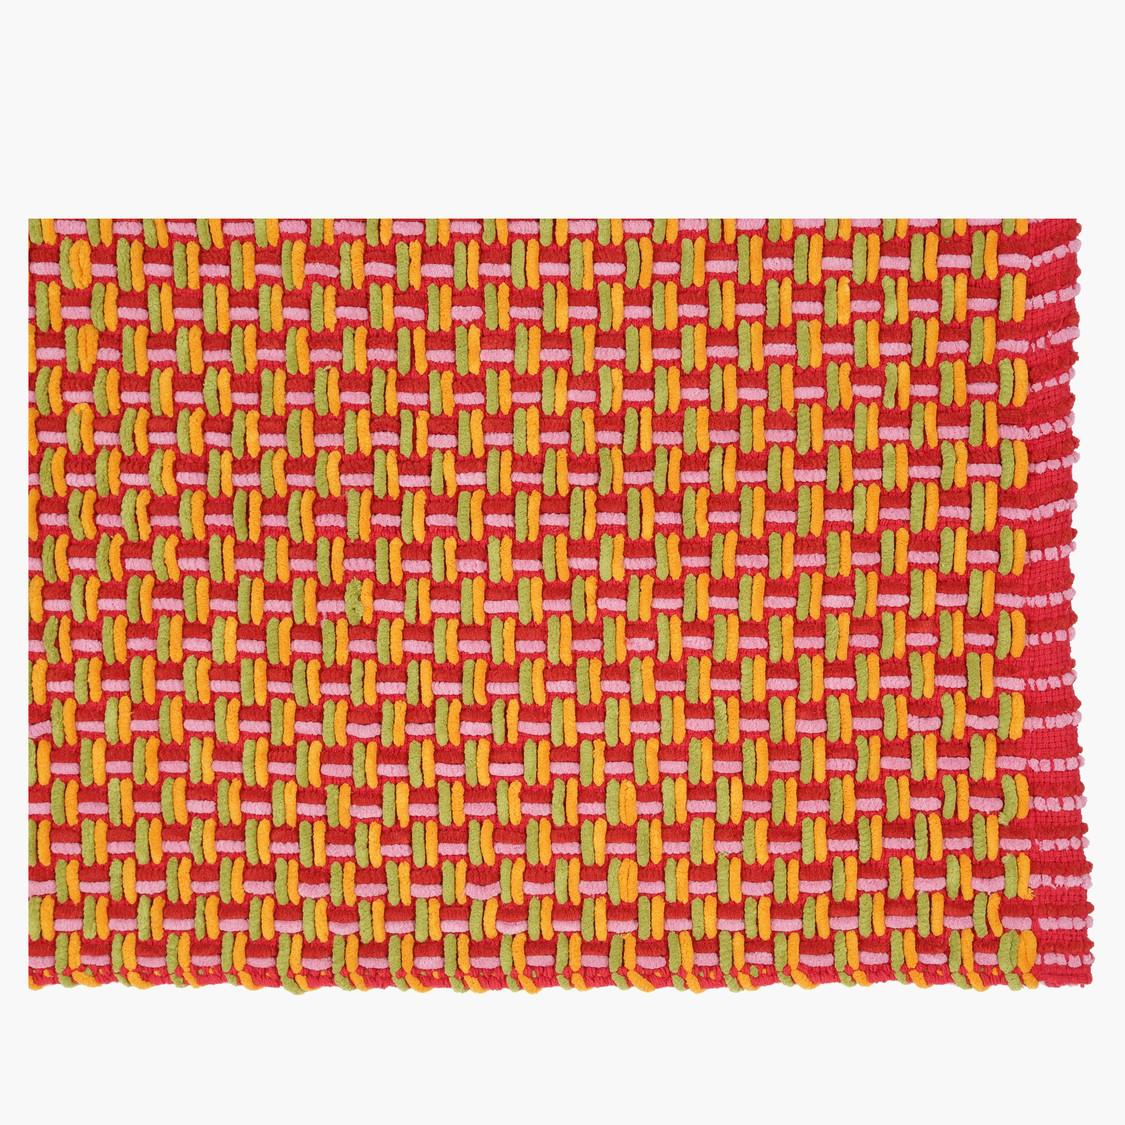 Textured Placemat - 90x60 cms